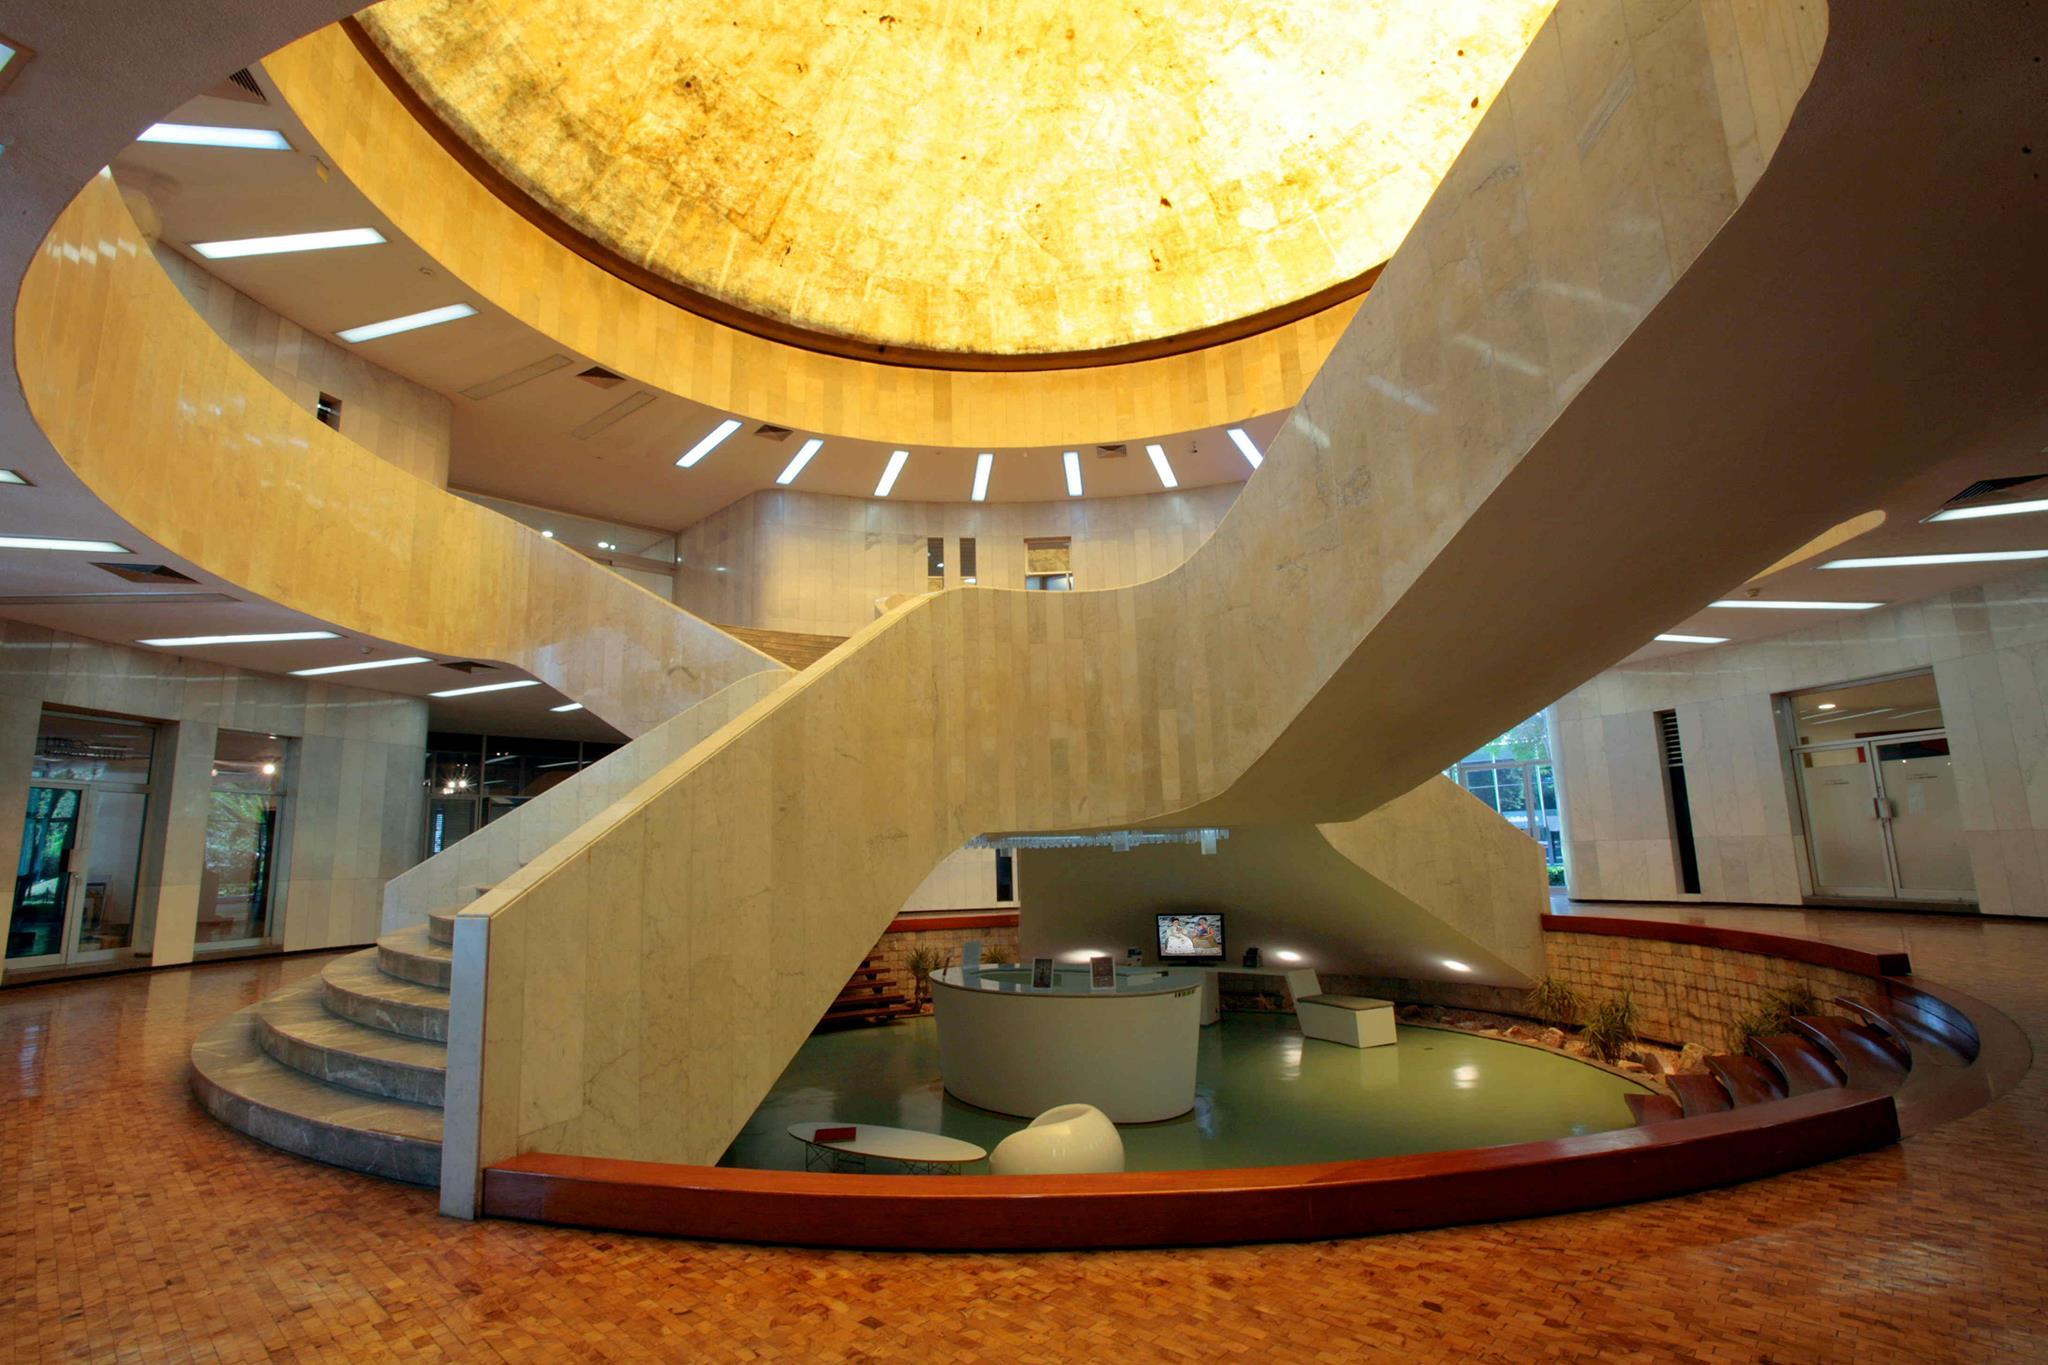 foto museo de arte moderno mexico facebook 1 septiembre 2014 interior